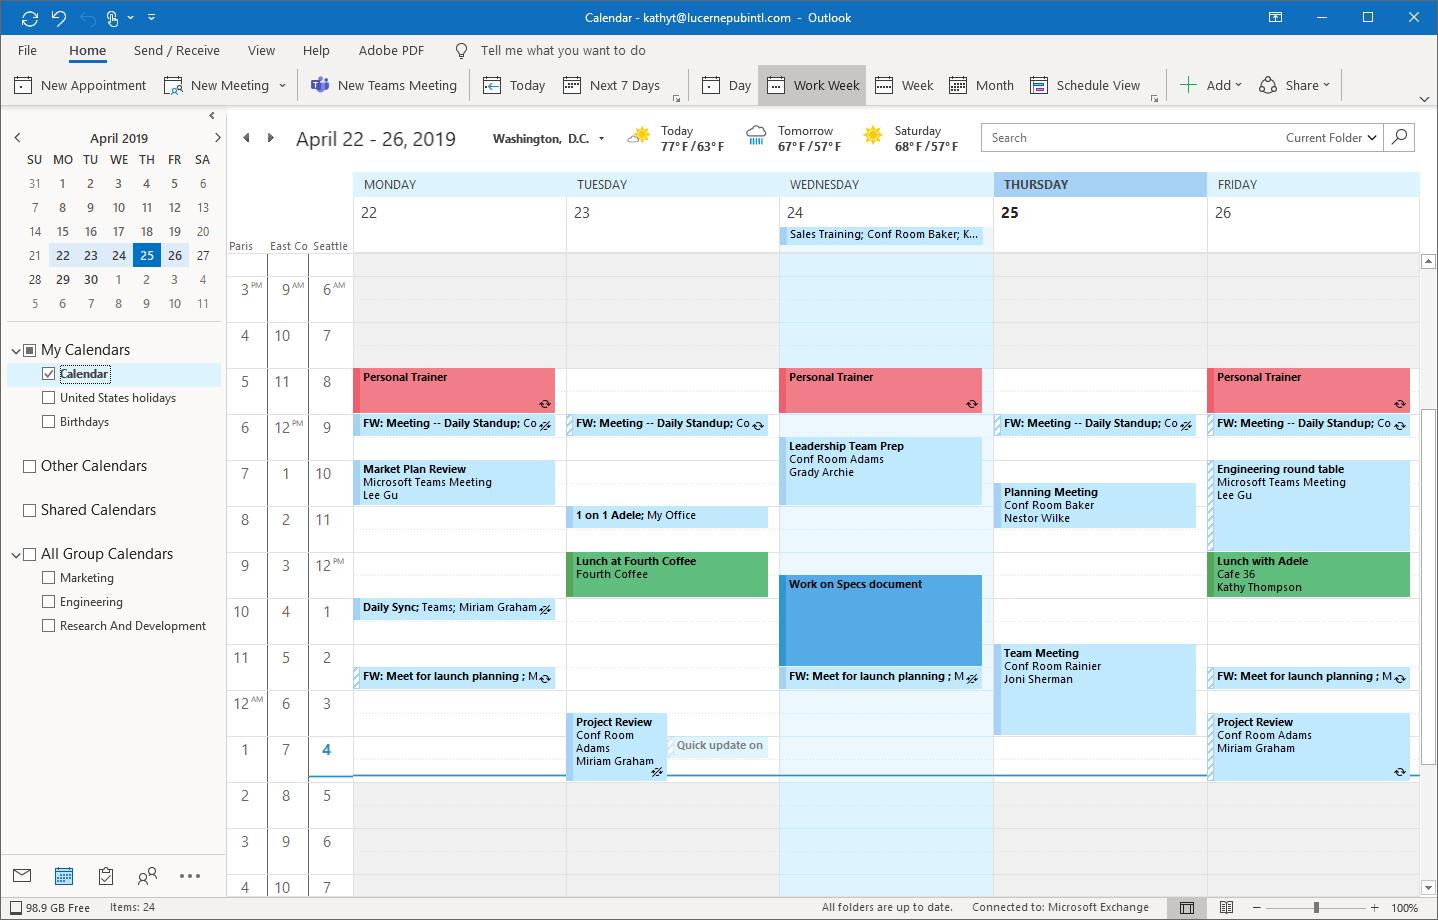 Outlook calendar tracking not updating